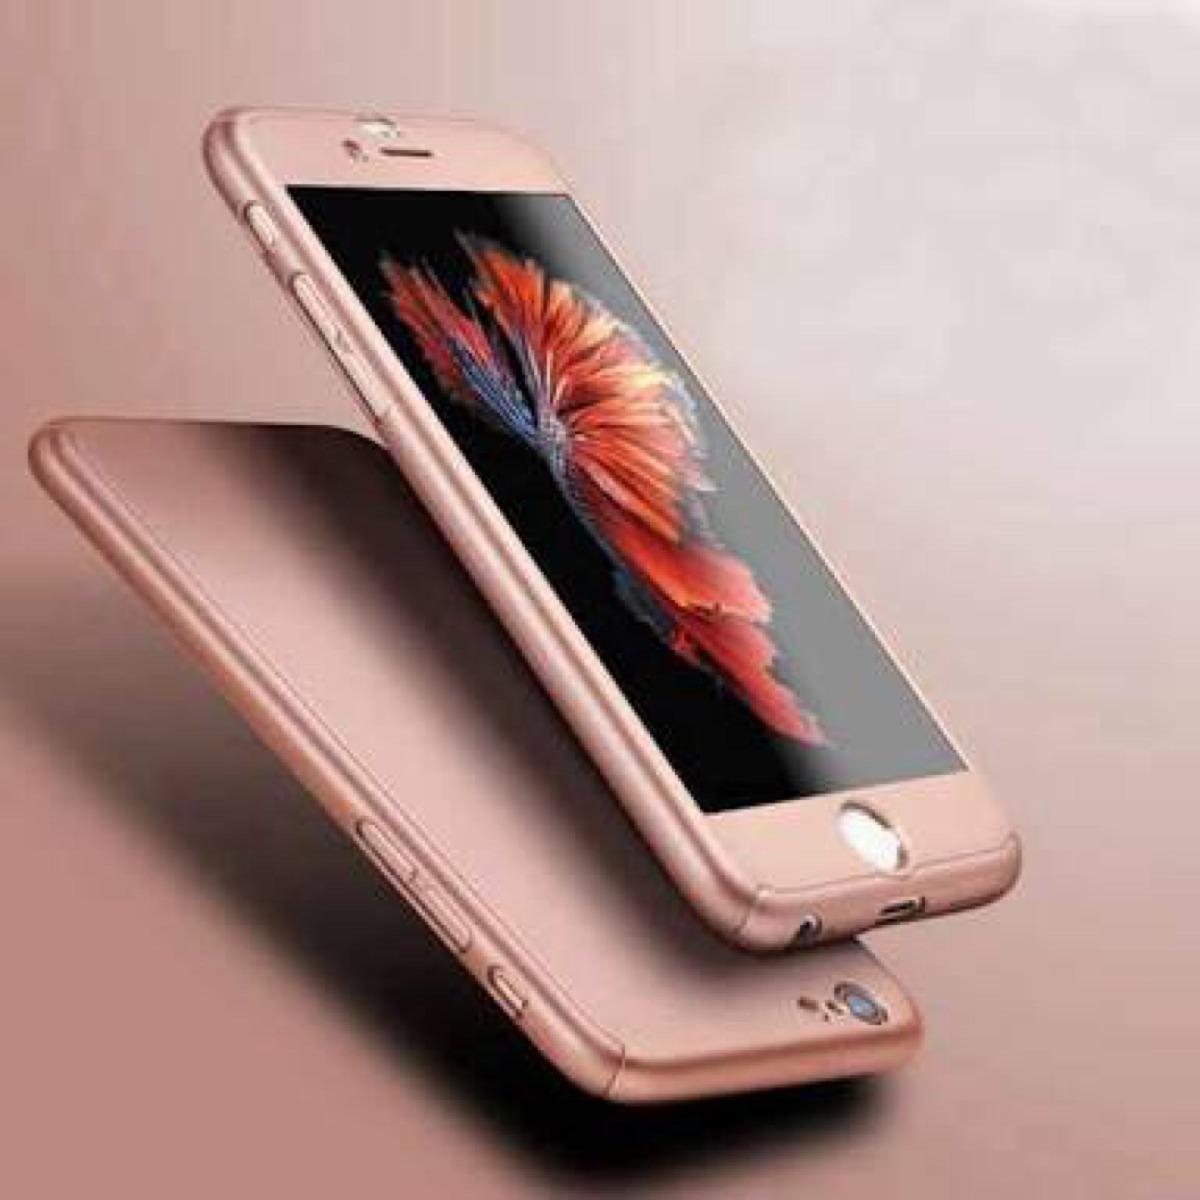 b1b018fe93e case funda protector 360 grados iphone 6 plus apple cristal. Cargando zoom.